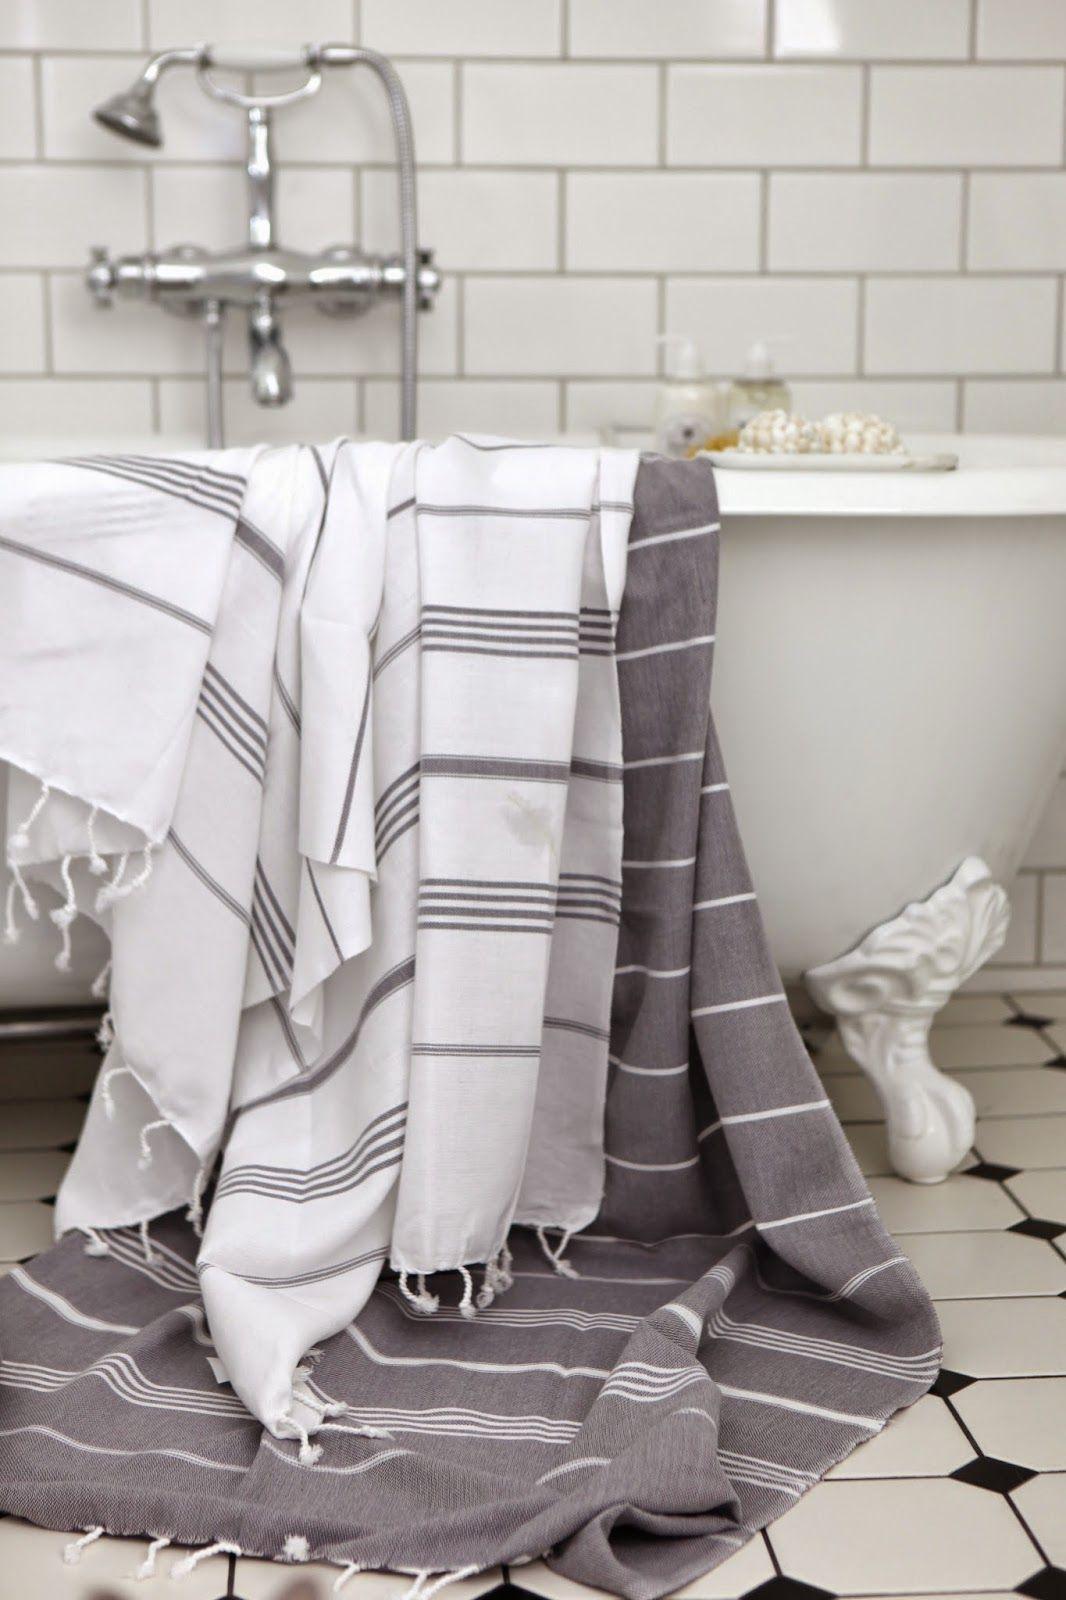 Accessoires Salle De Bain Turquie ~ lilla villa vita turkish towels pestemals hamman towels